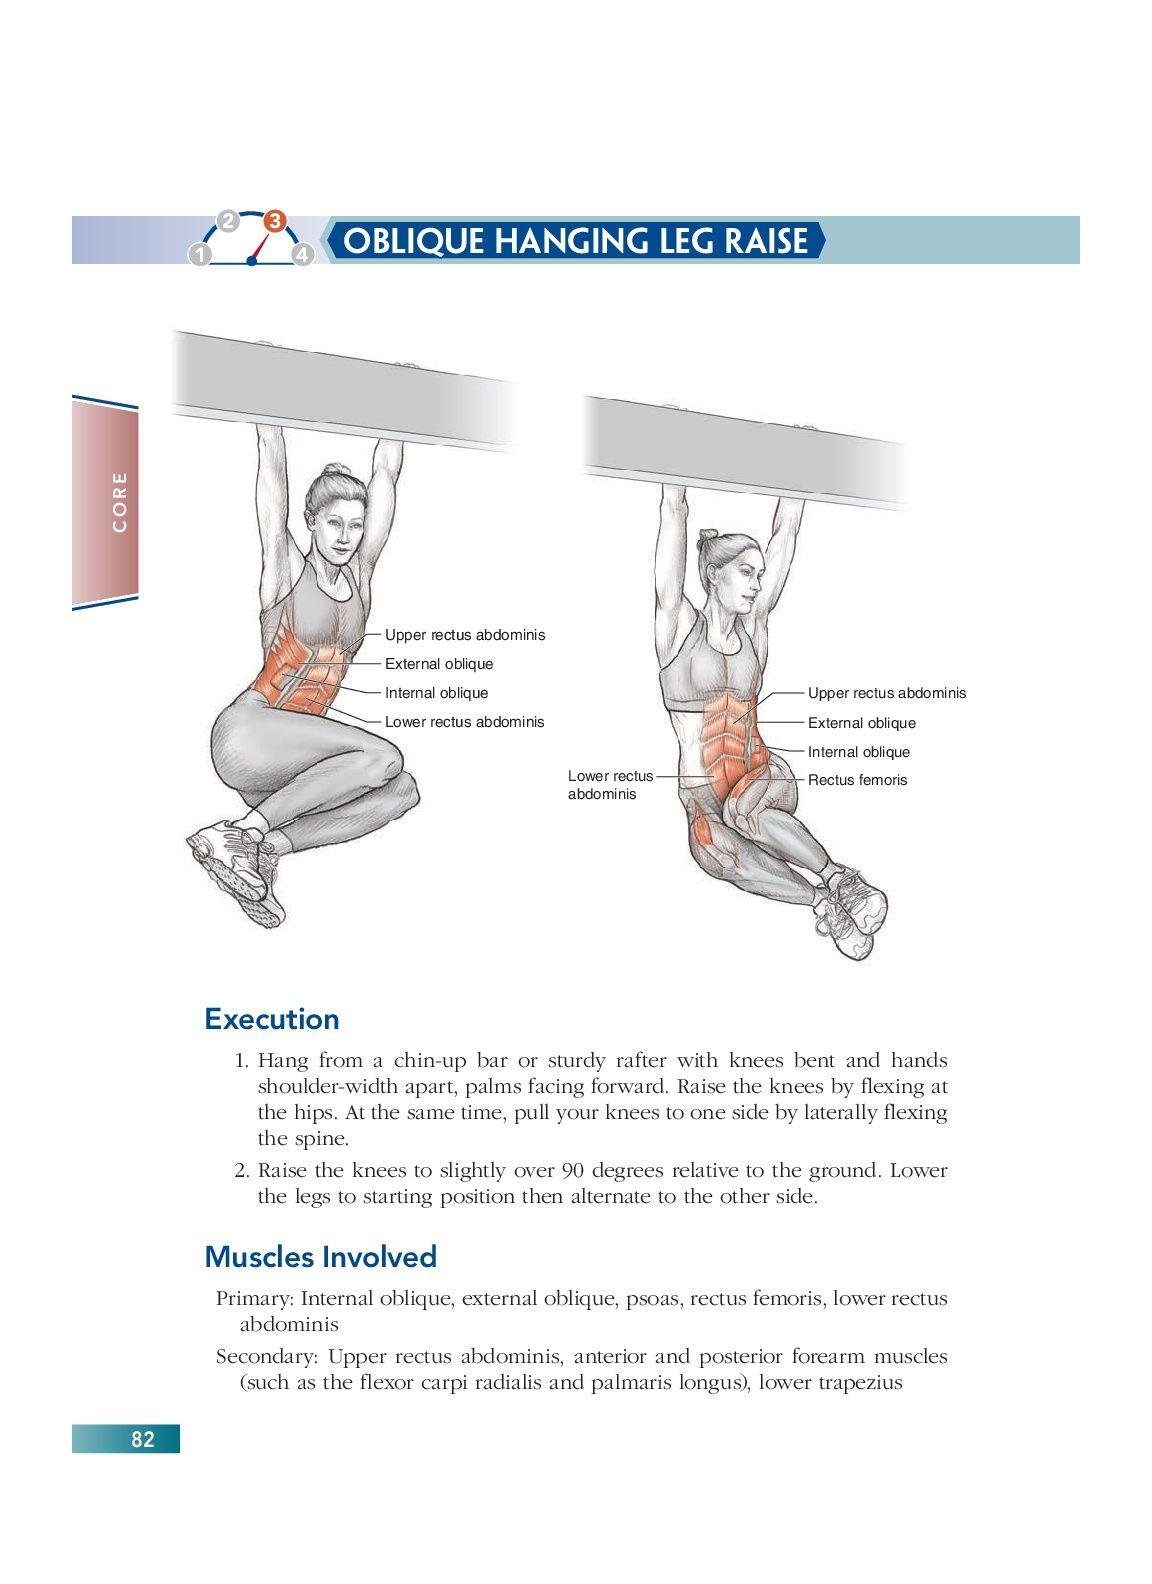 Chapter 5 Core 82 Bodyweight Strength Training Anatomy Pinterest